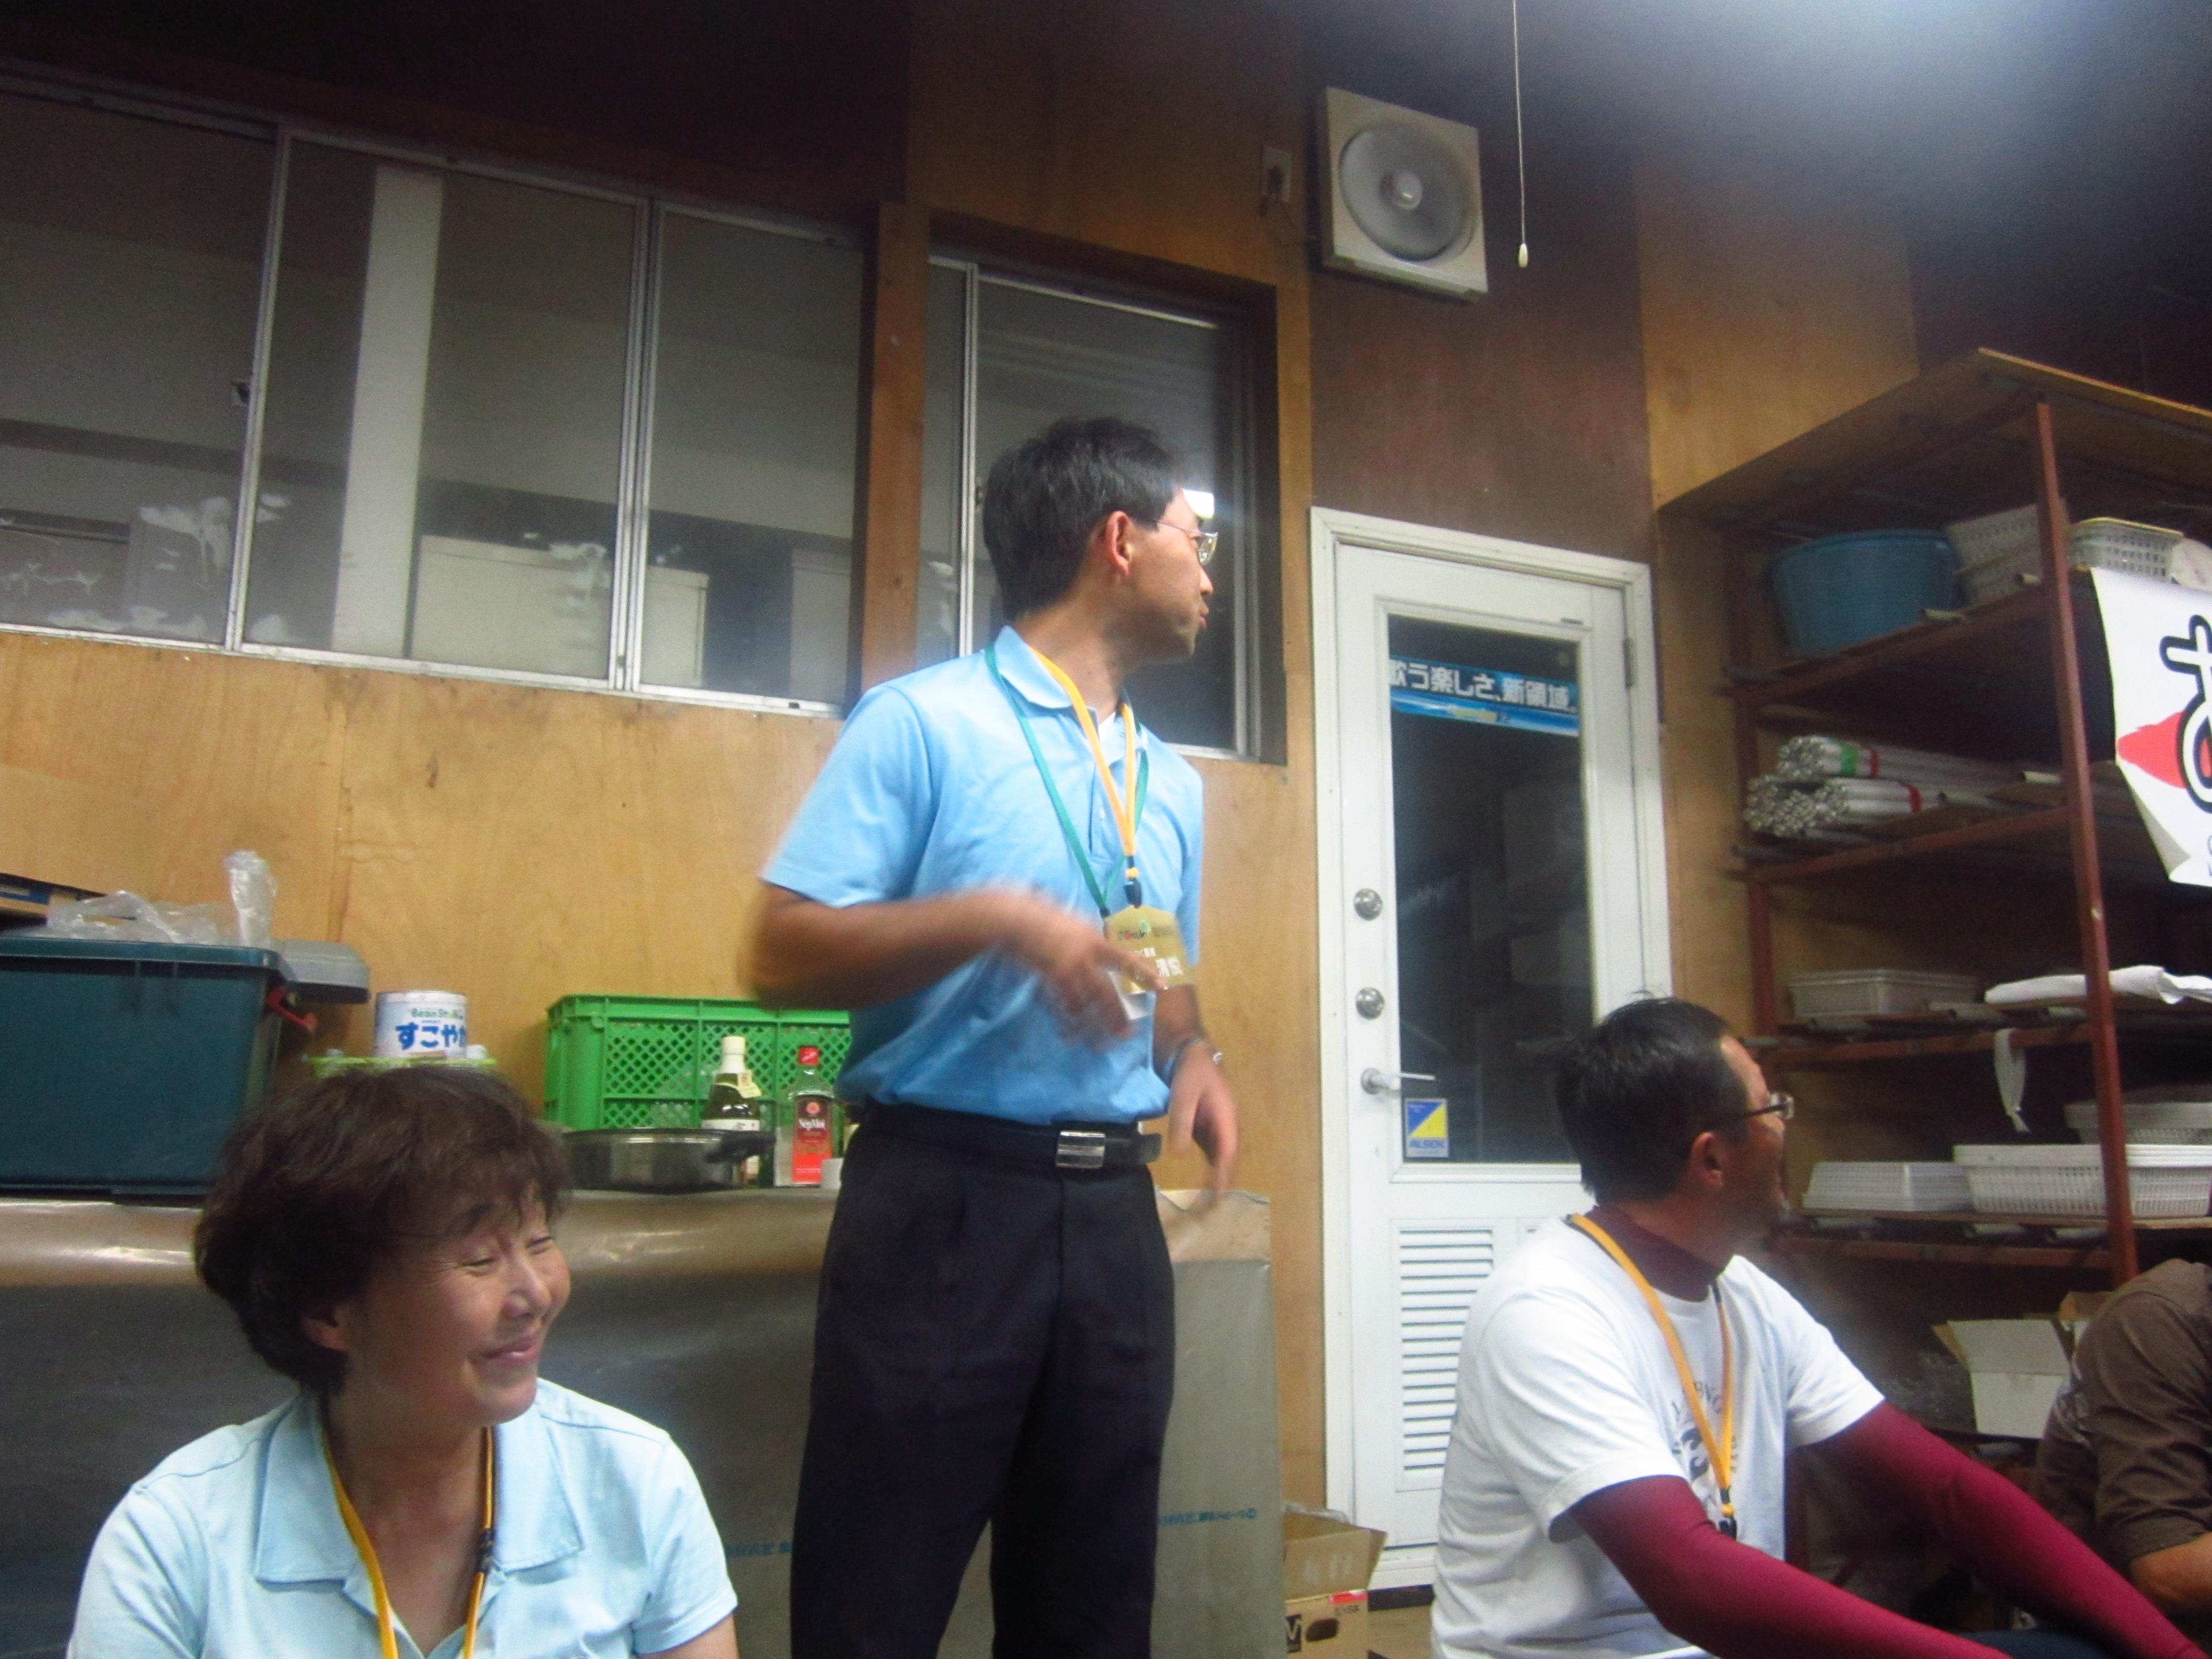 IMG 4293 - 麻布十番納涼祭り25,26日(七戸町出店)